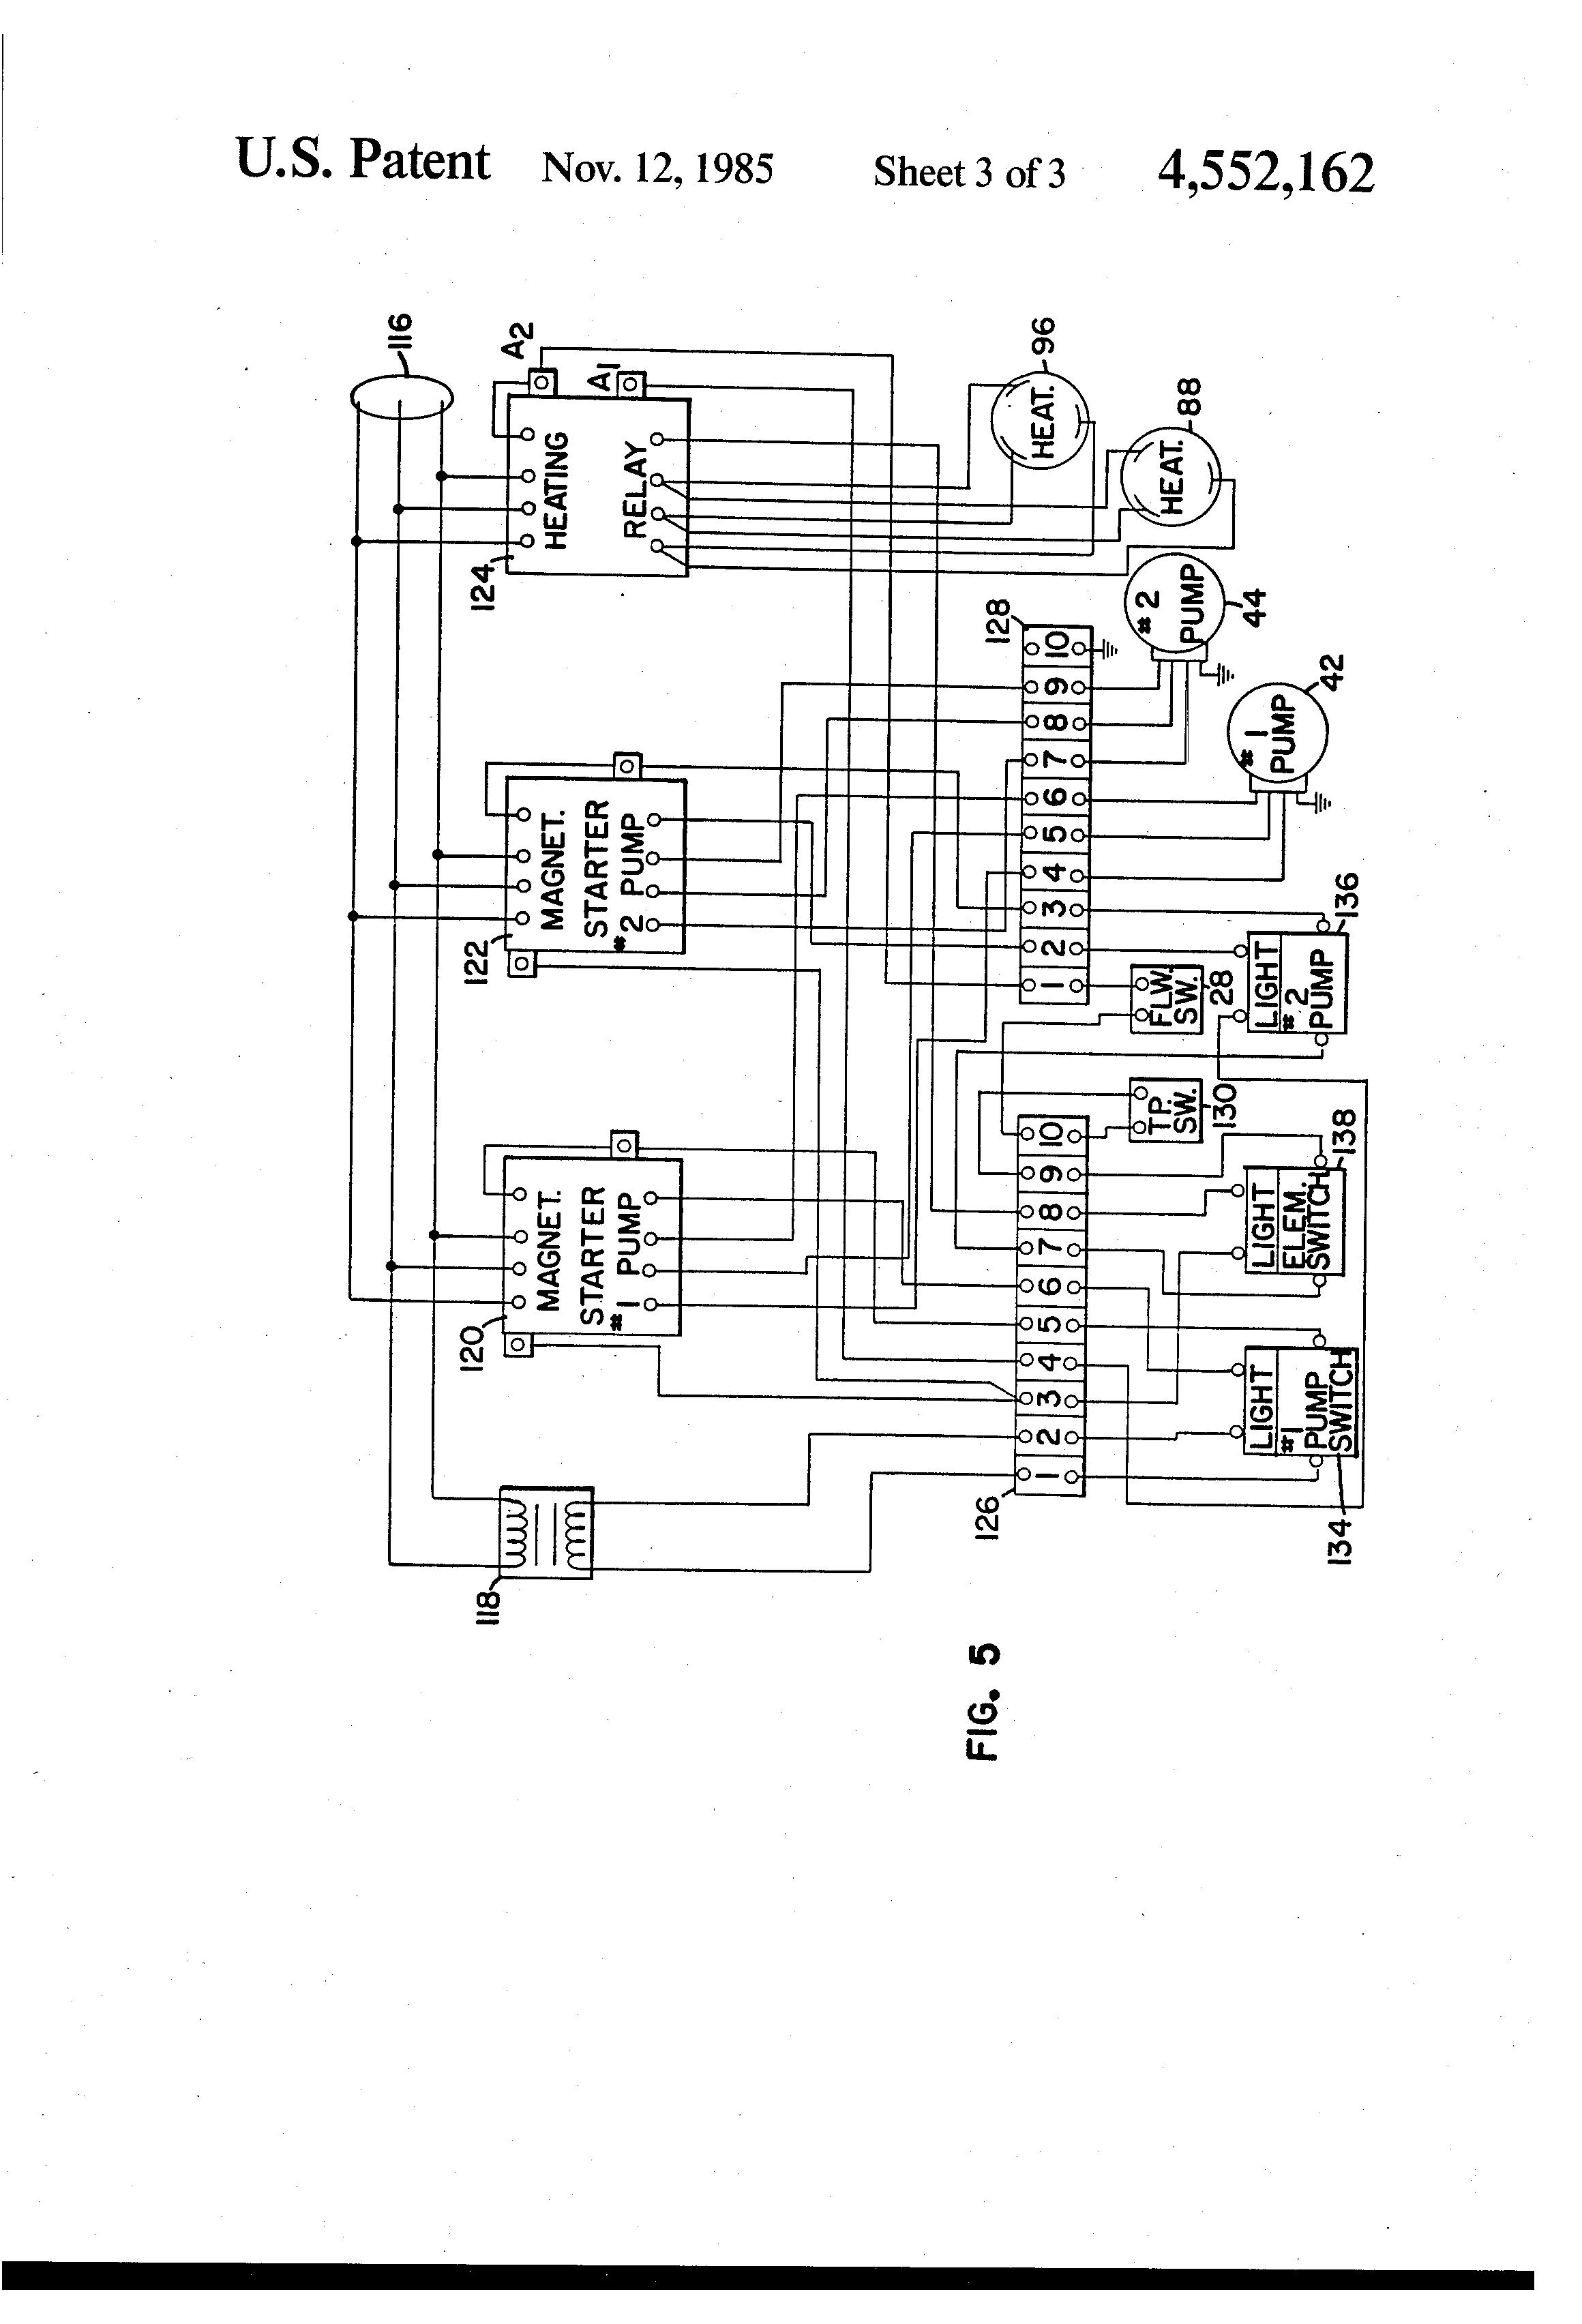 Water Heater Manual  Alkota Pressure Washer Wiring Diagram